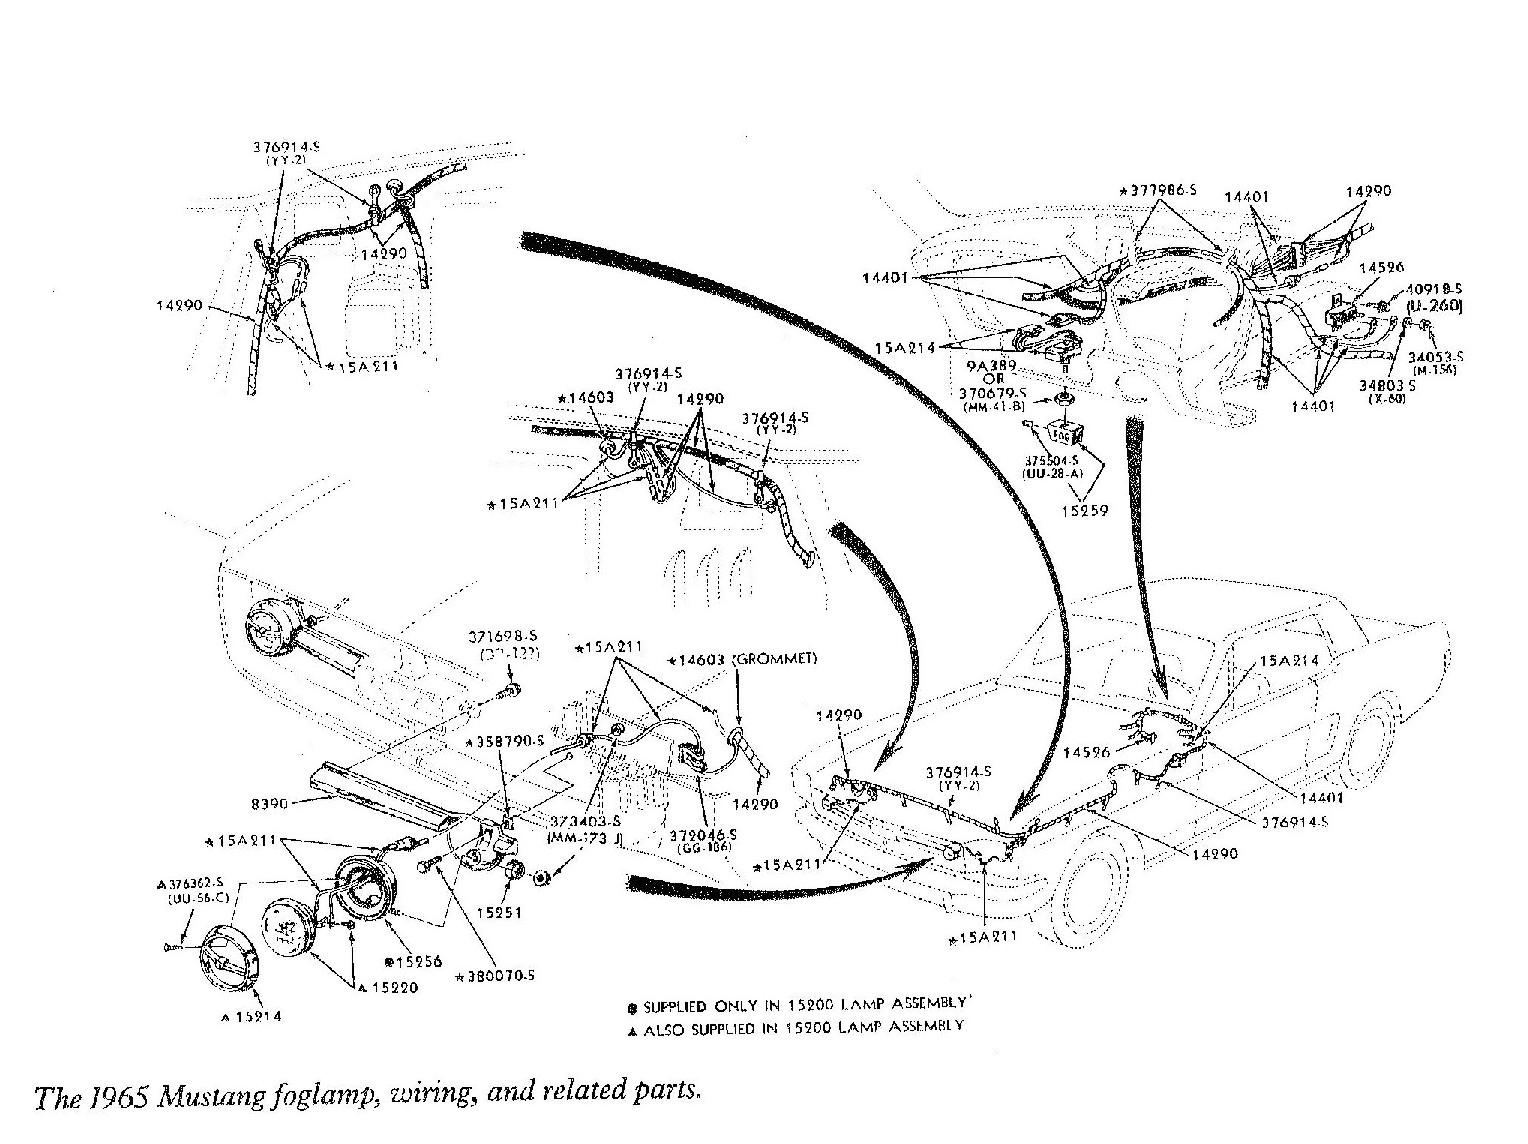 1966 Fender Mustang Wiring Diagram - Wiring Diagram